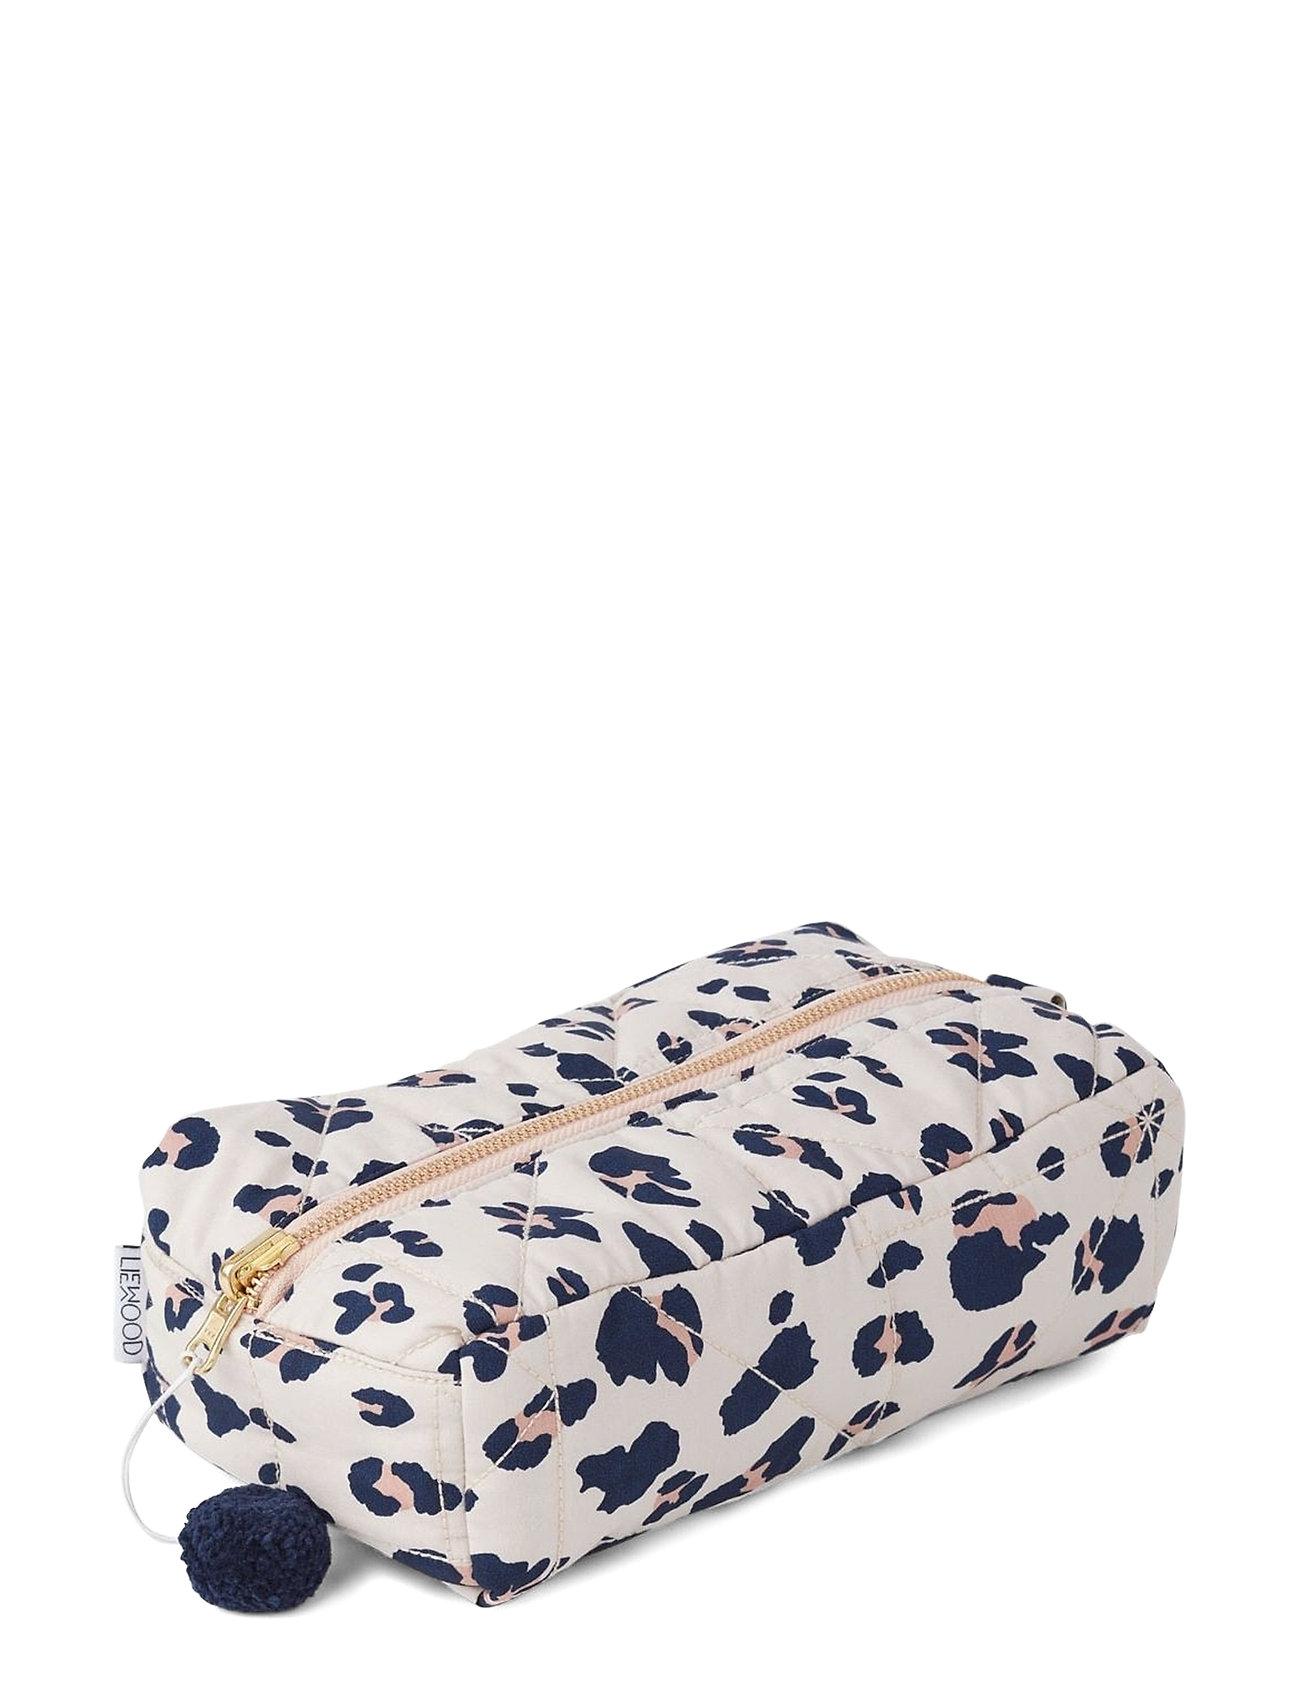 Liewood Beate toiletry bag - LEO BEIGE BEAUTY